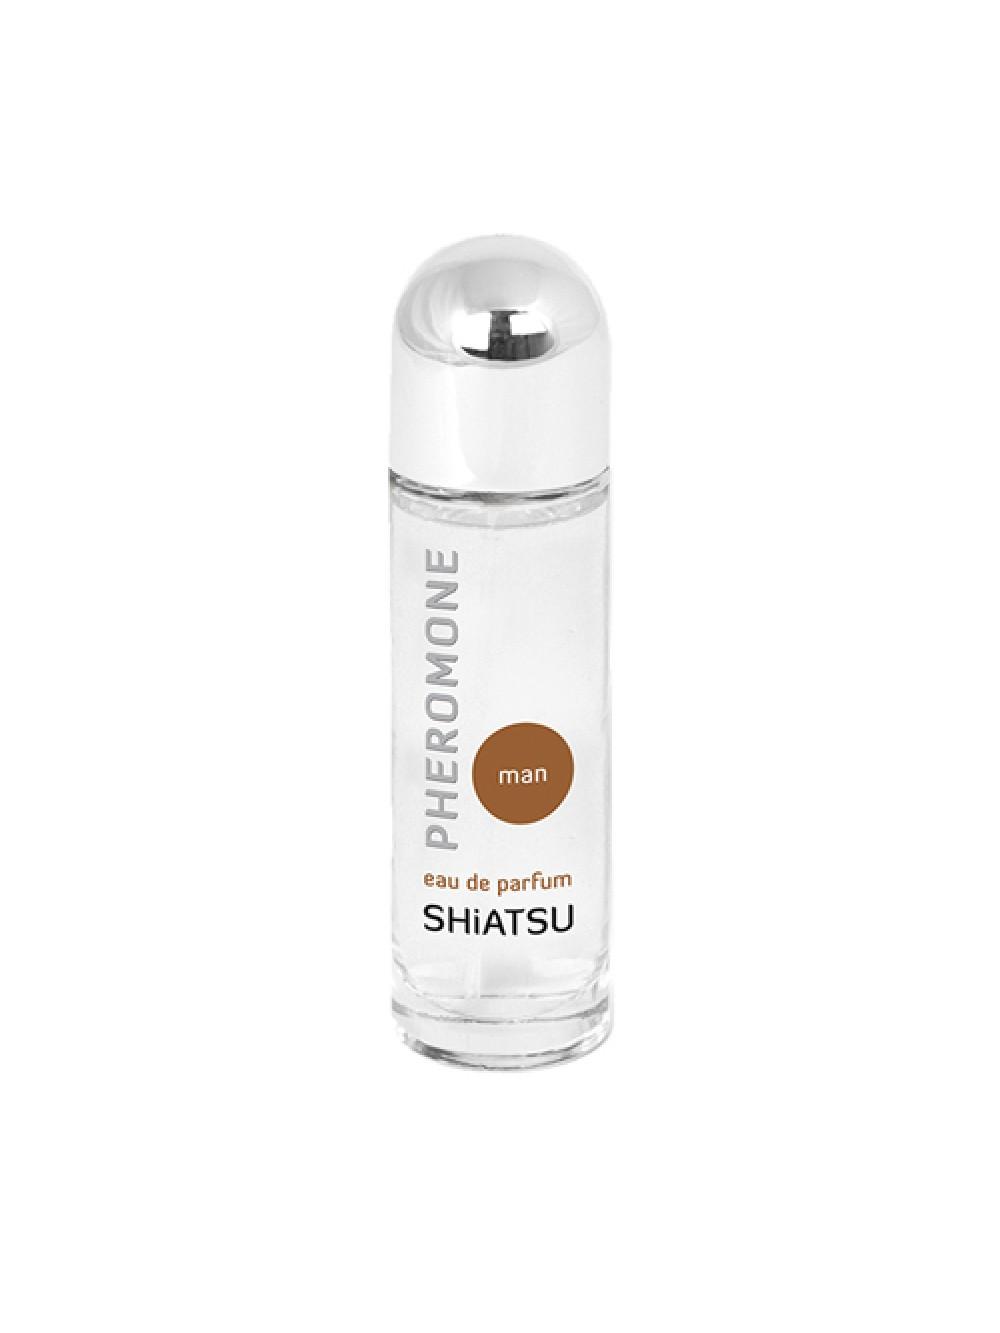 Shiatsu Pheromone Perfume Man 25 ml 4042342003000